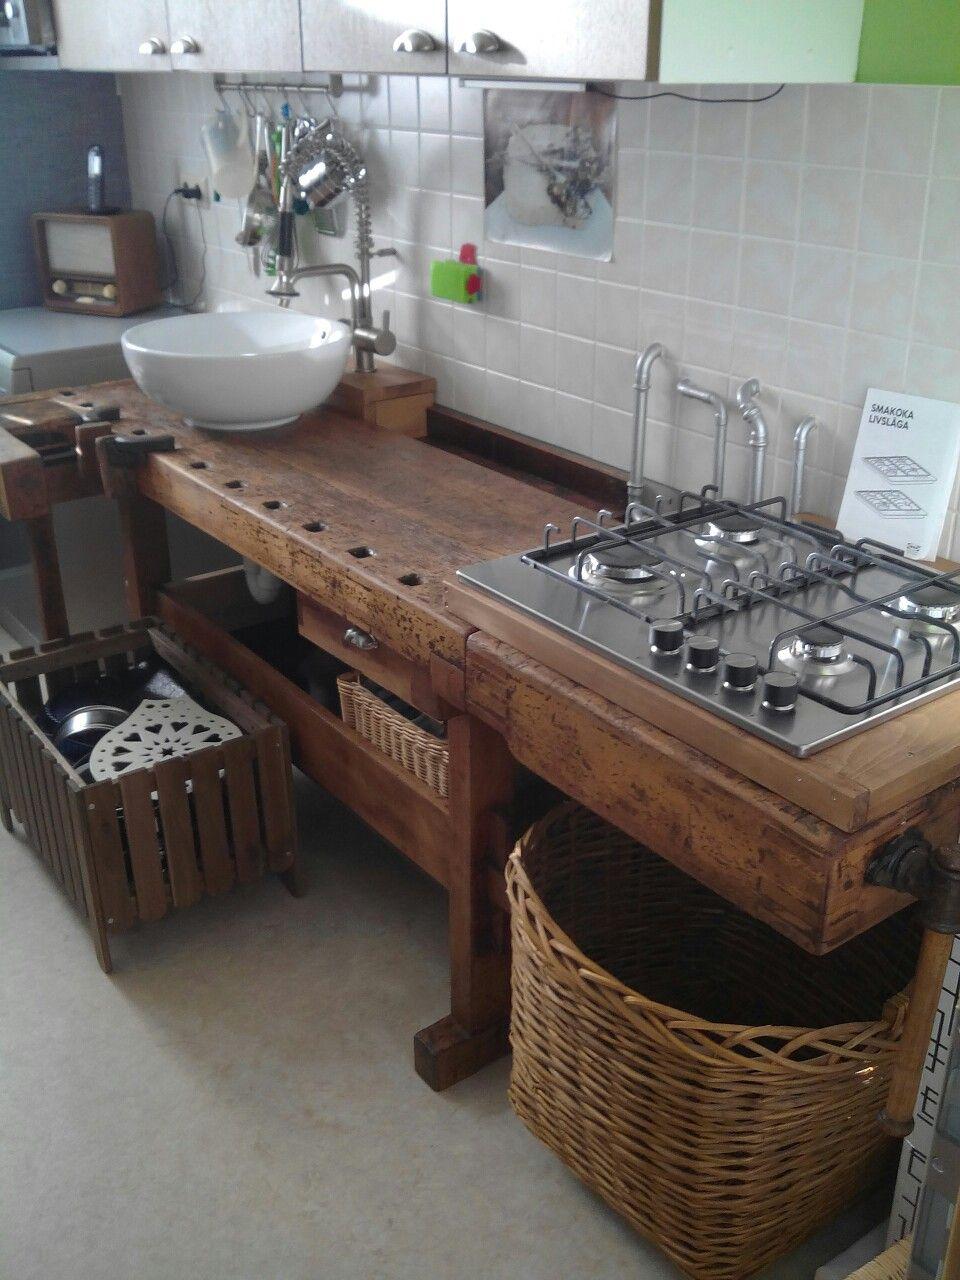 Hobelbank Küche Mehr | xxx | Pinterest | Hobelbank, Küche und Möbel